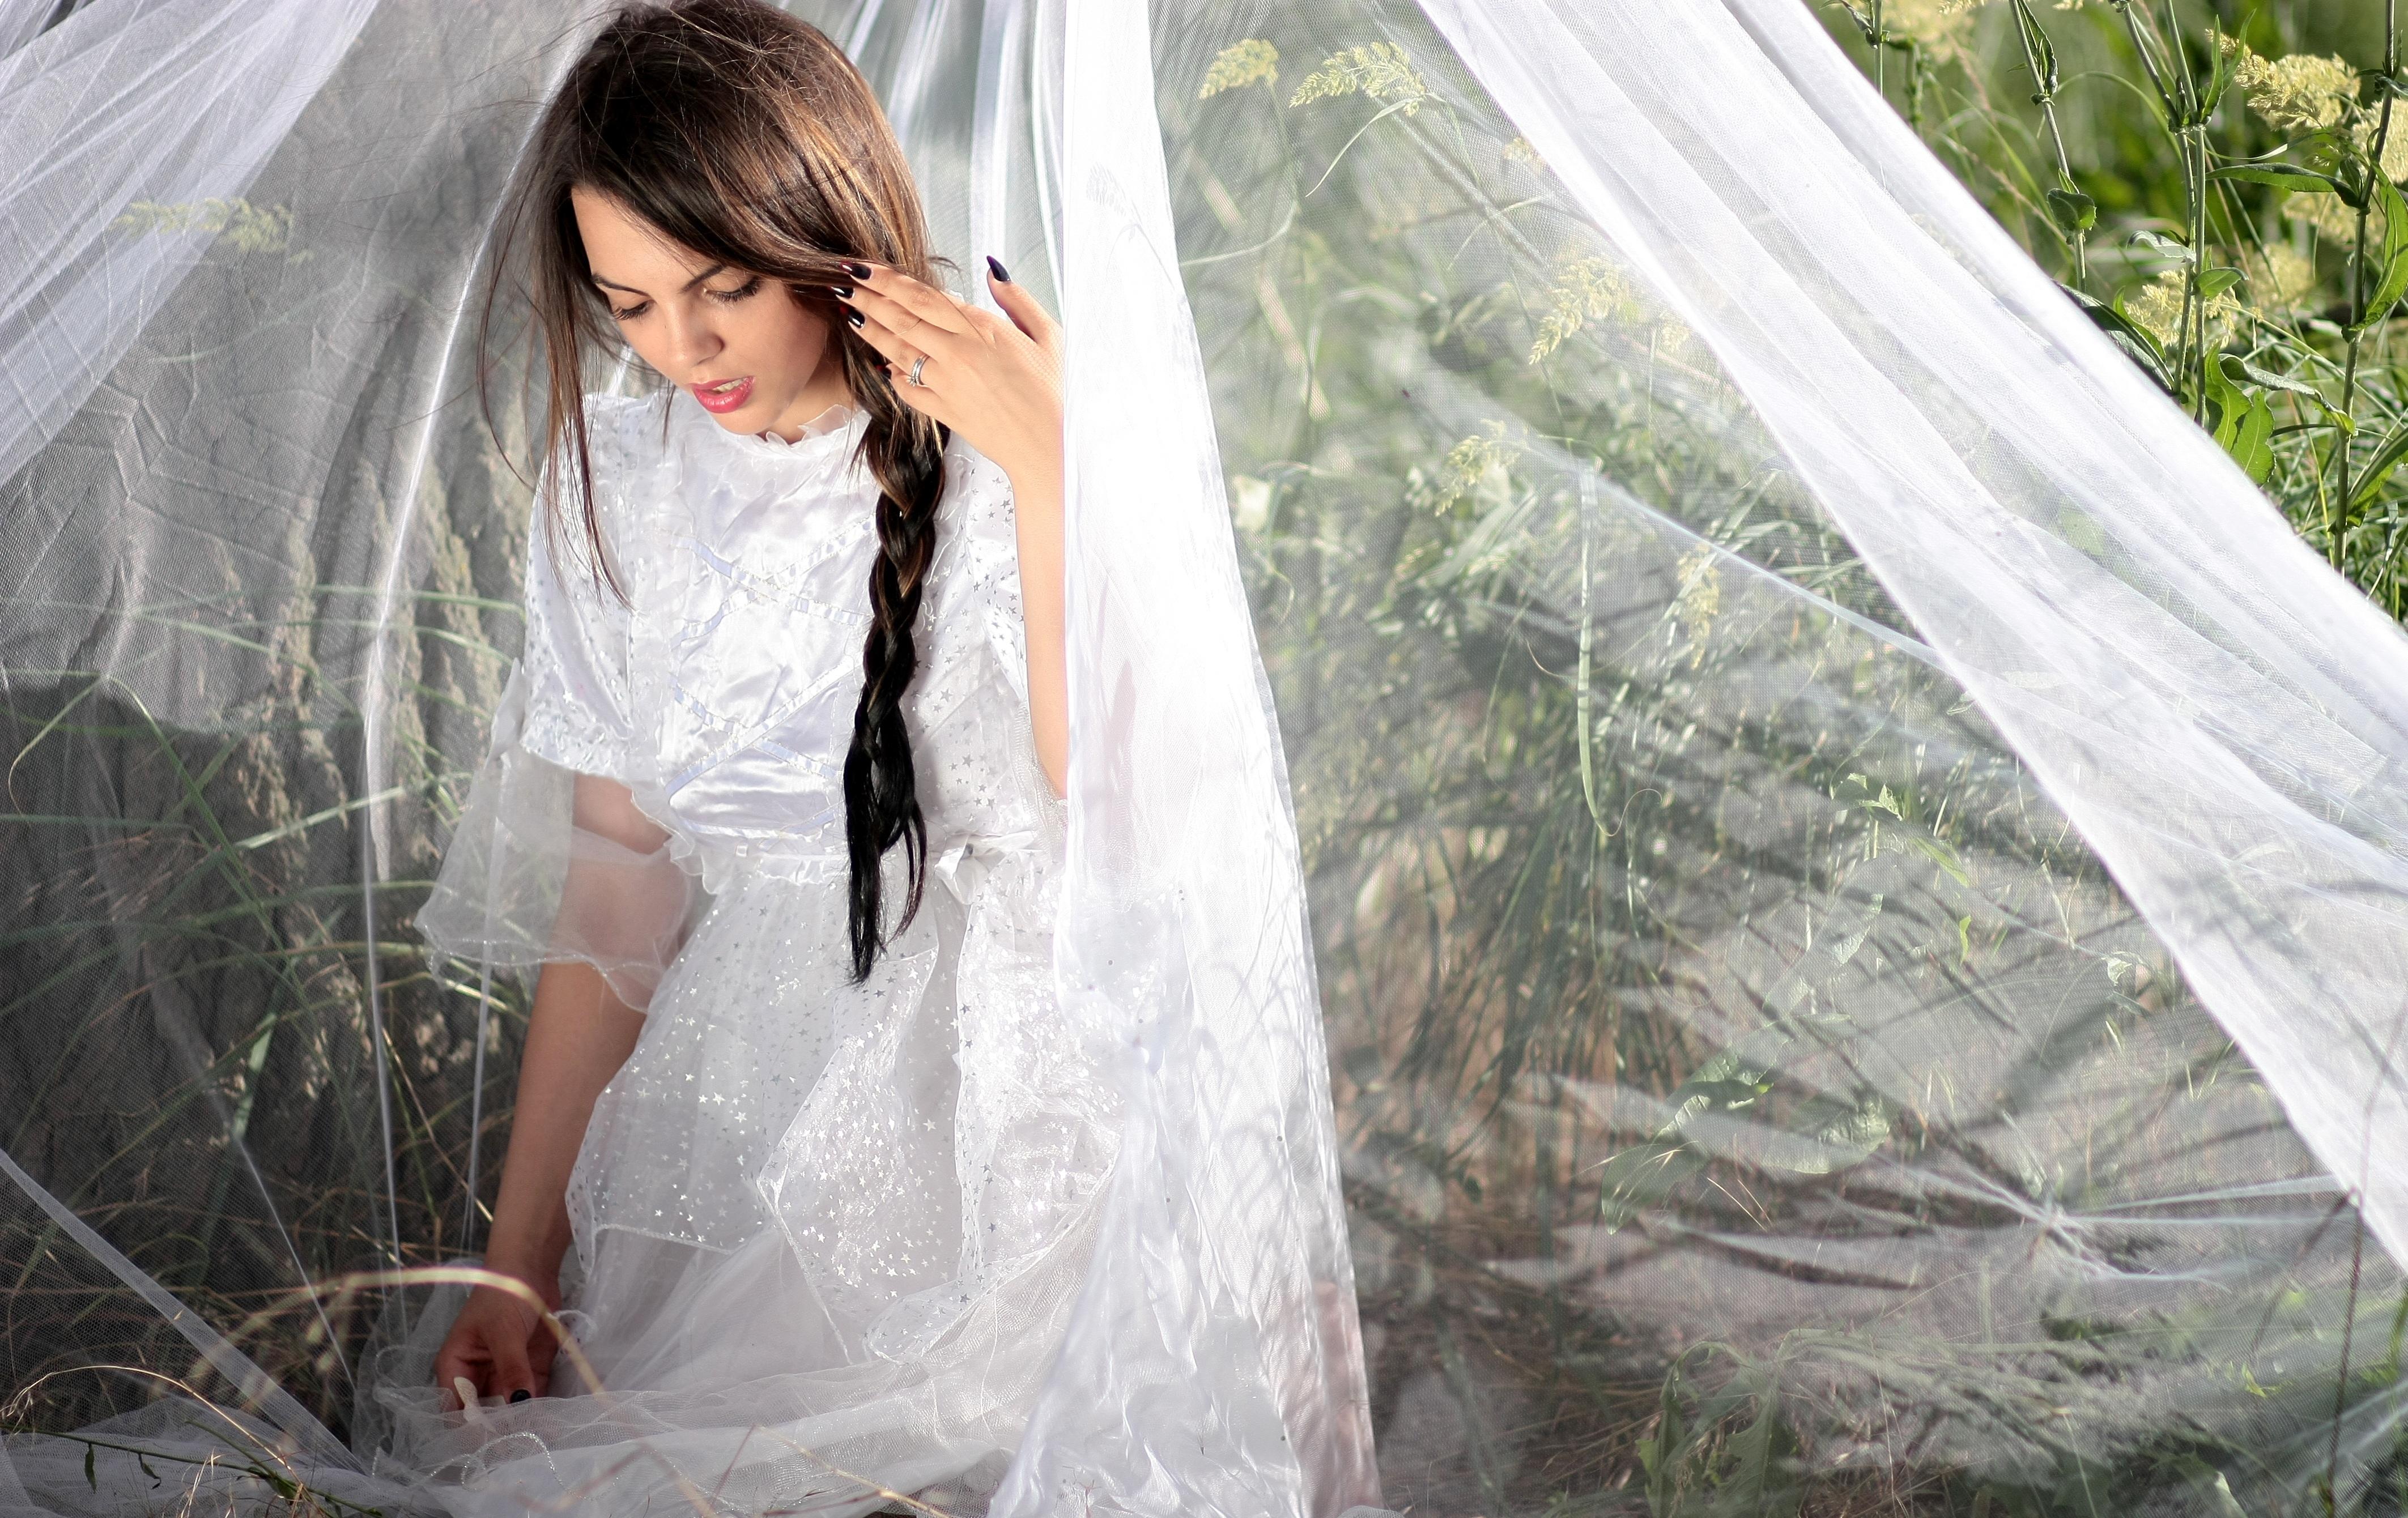 Free Images : girl, white, wedding dress, bride, long hair, ceremony ...